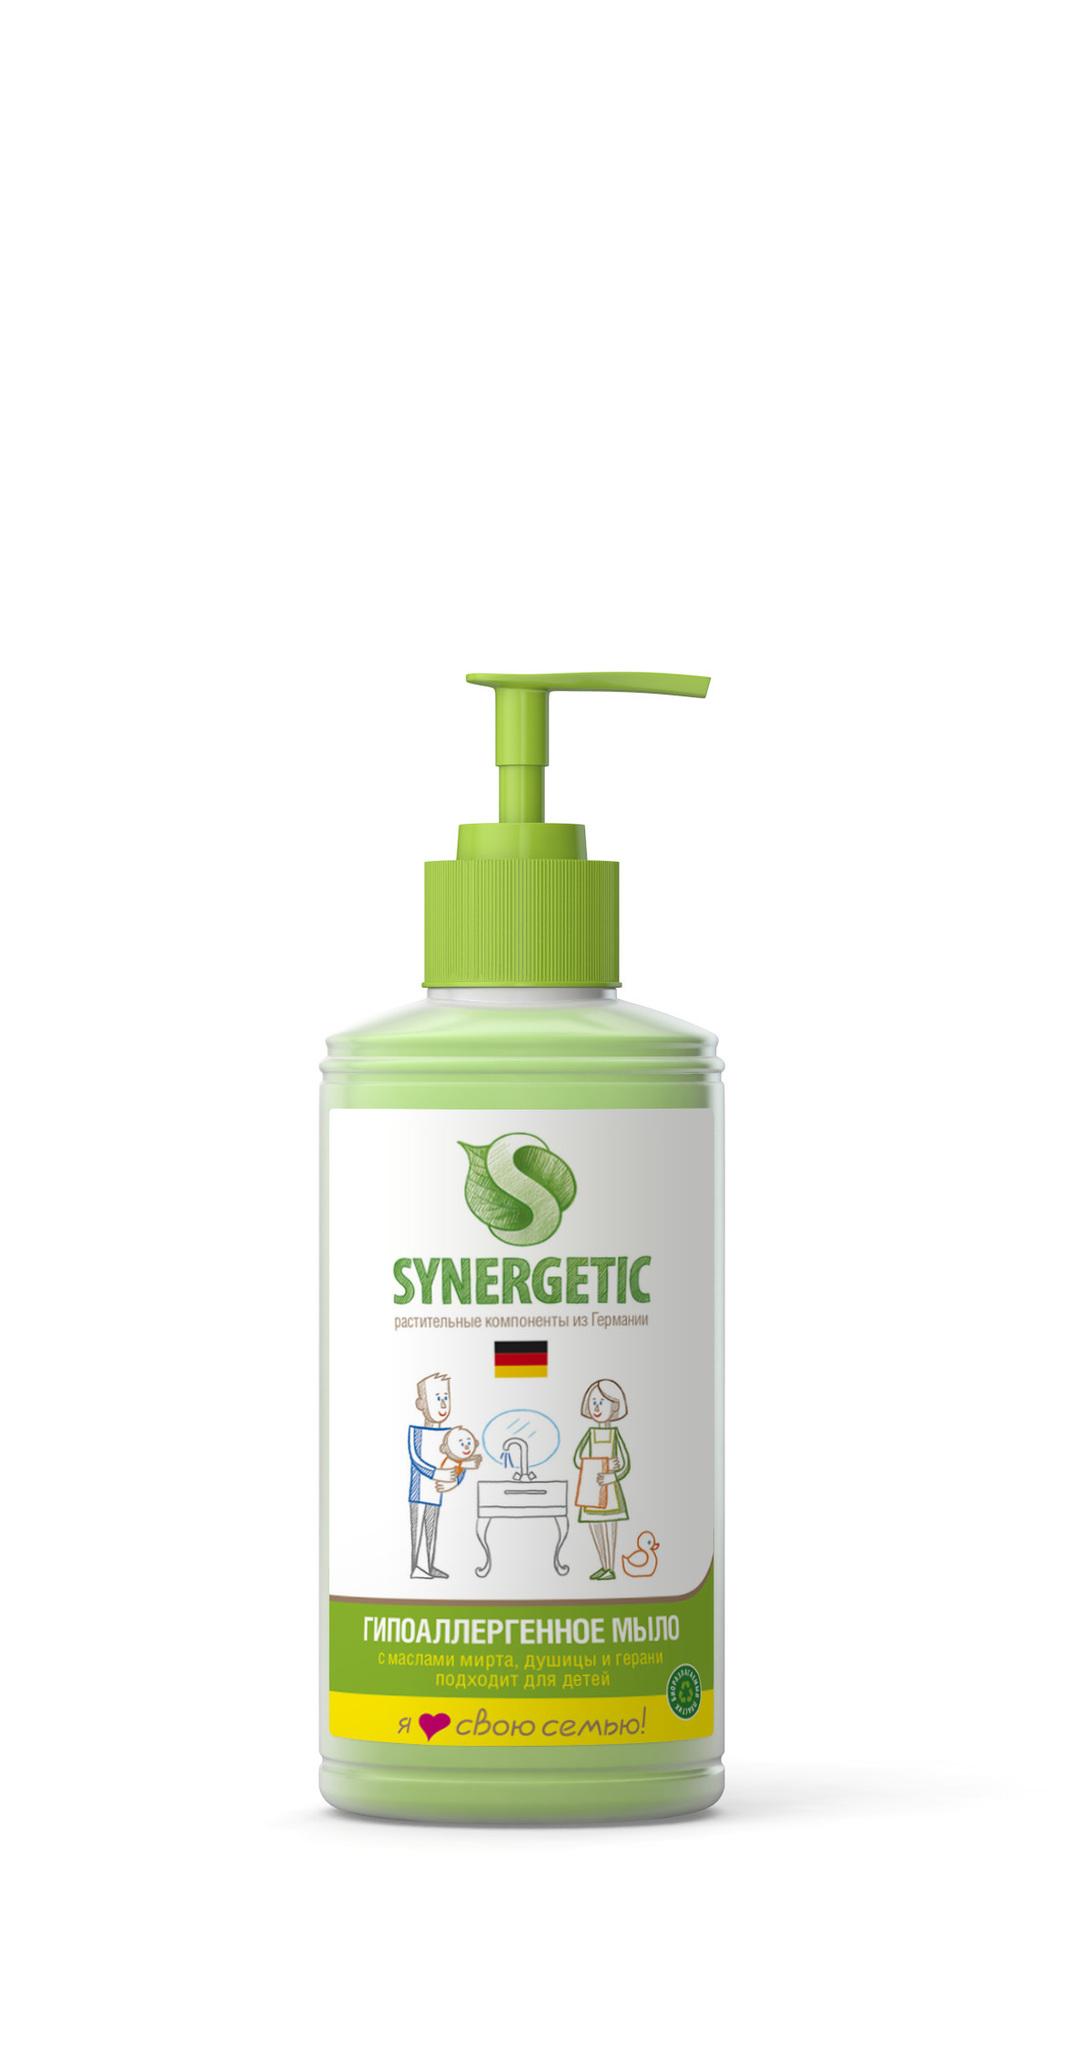 Жидкое мыло для мытья рук, флакон 0,25л дозатор (SYNERGETIC)